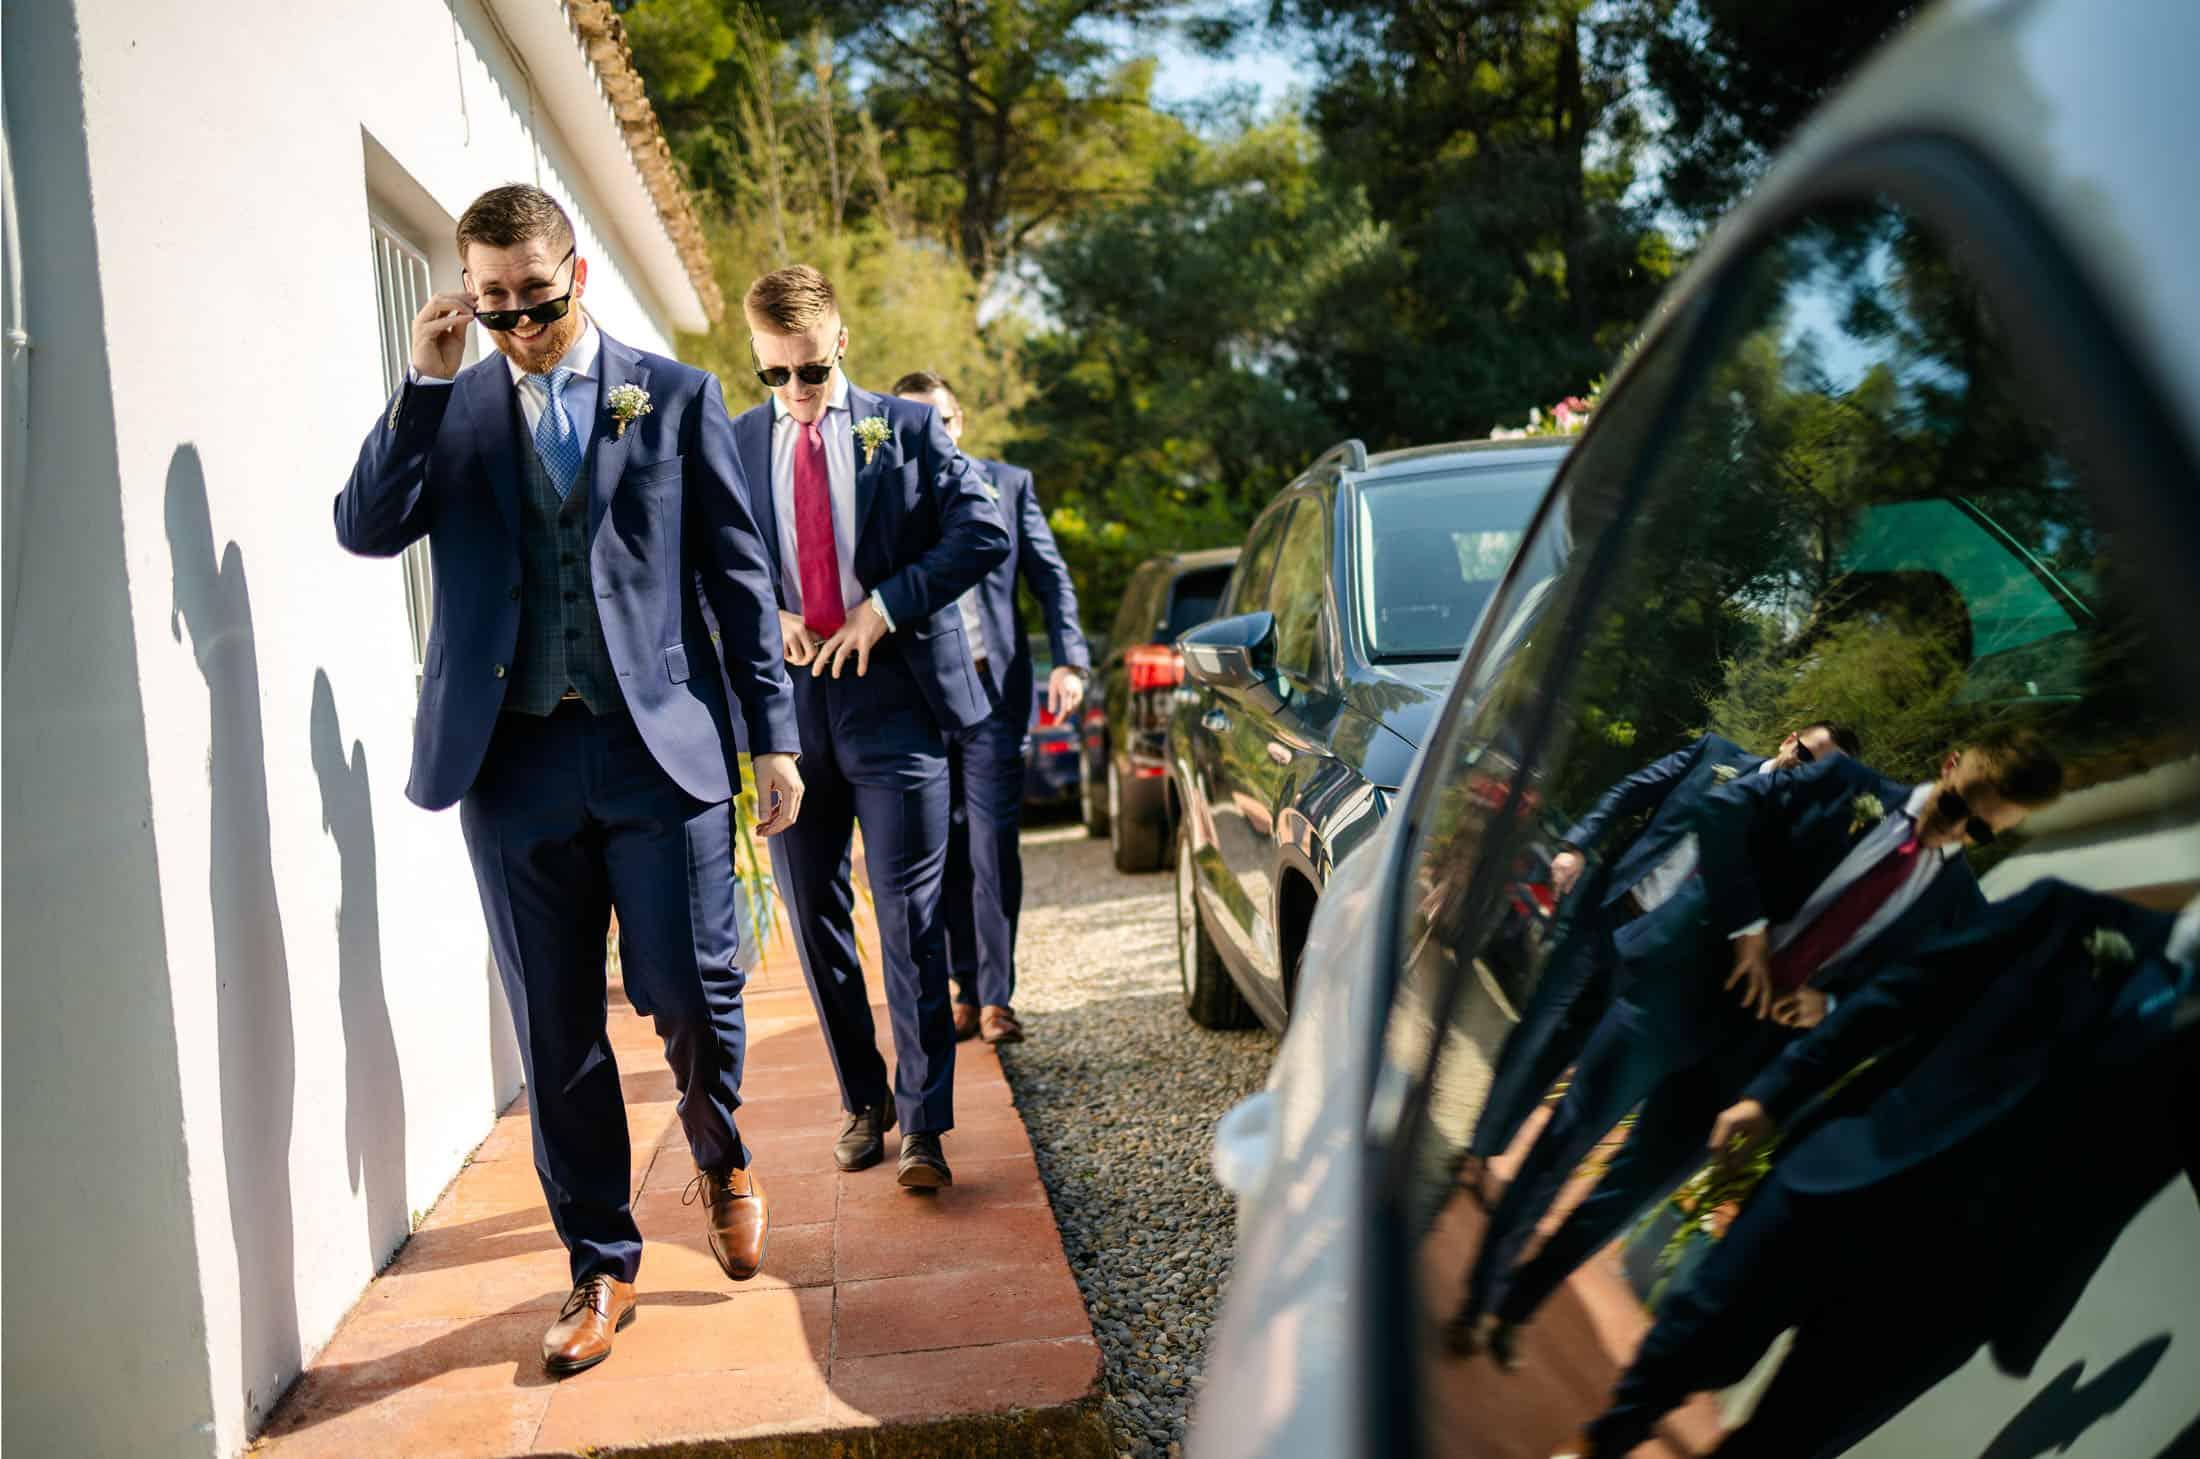 Can Pares Sitges Barcelona Wedding Photos - Lauren & Stephen, 2019